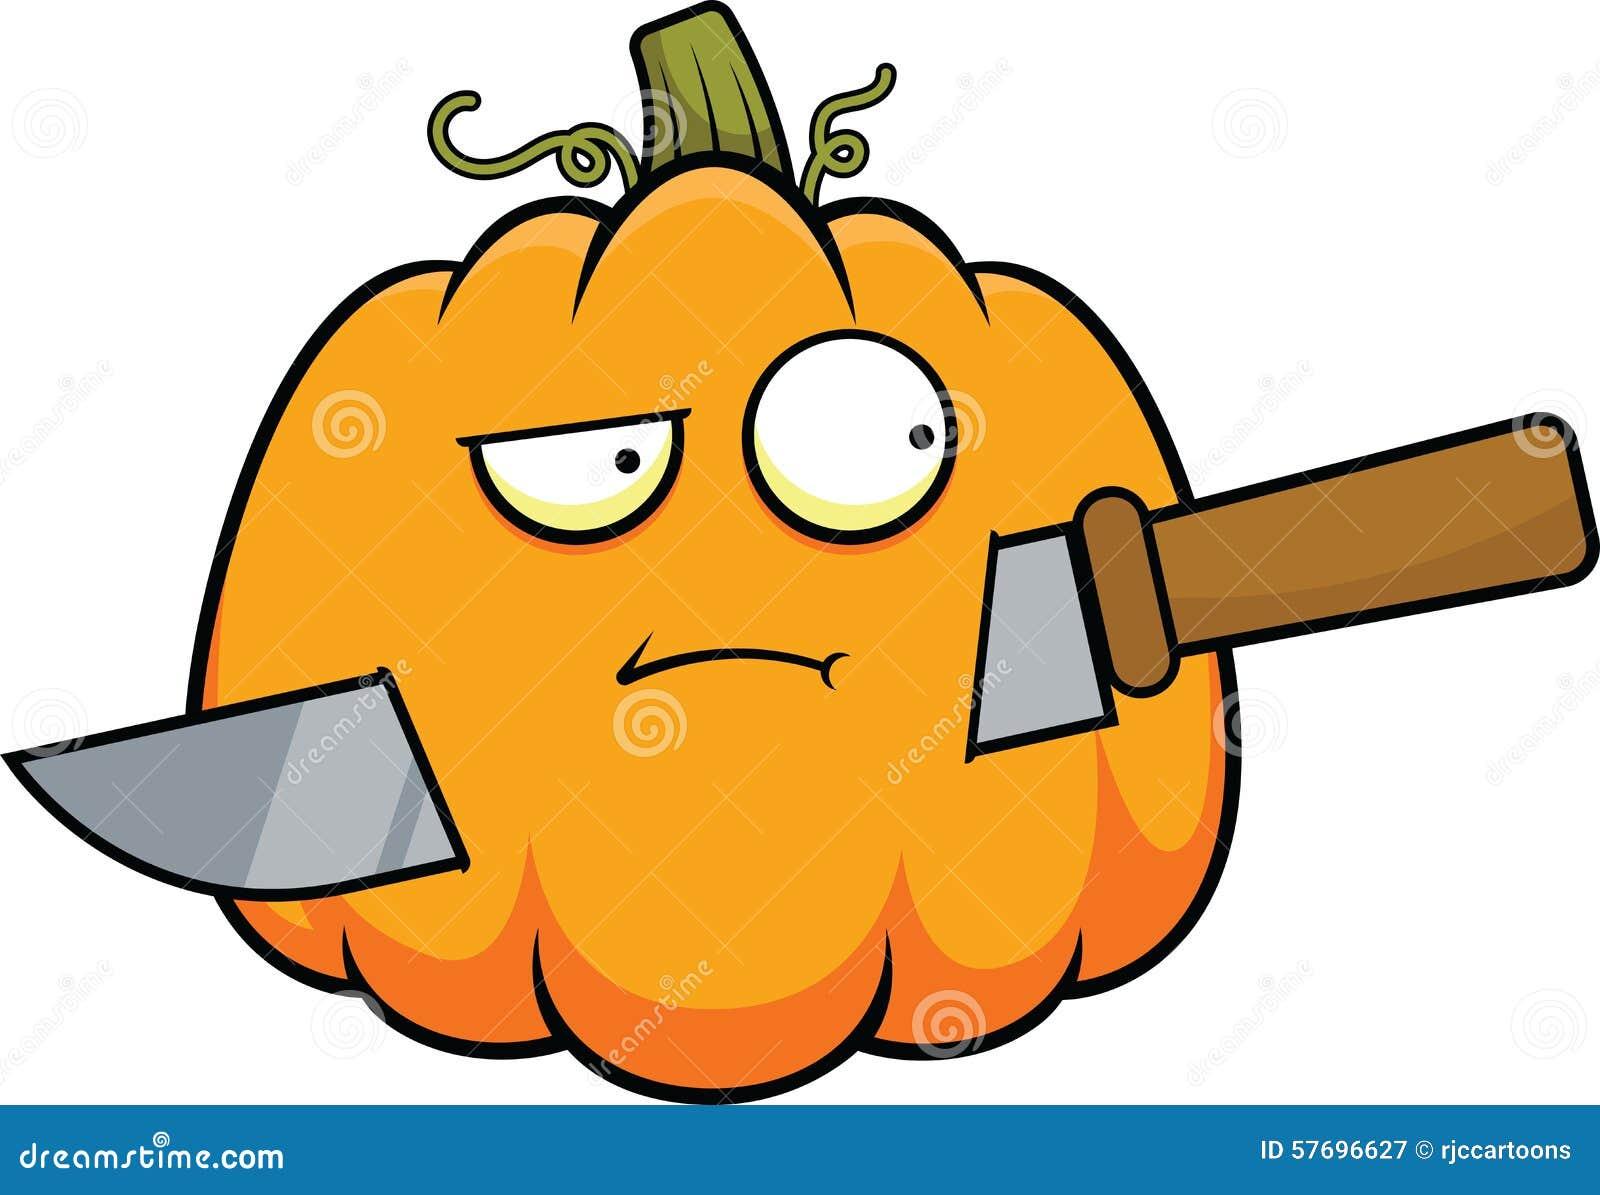 Cartoon Pumpkin And Knife Stock Vector - Image: 57696627